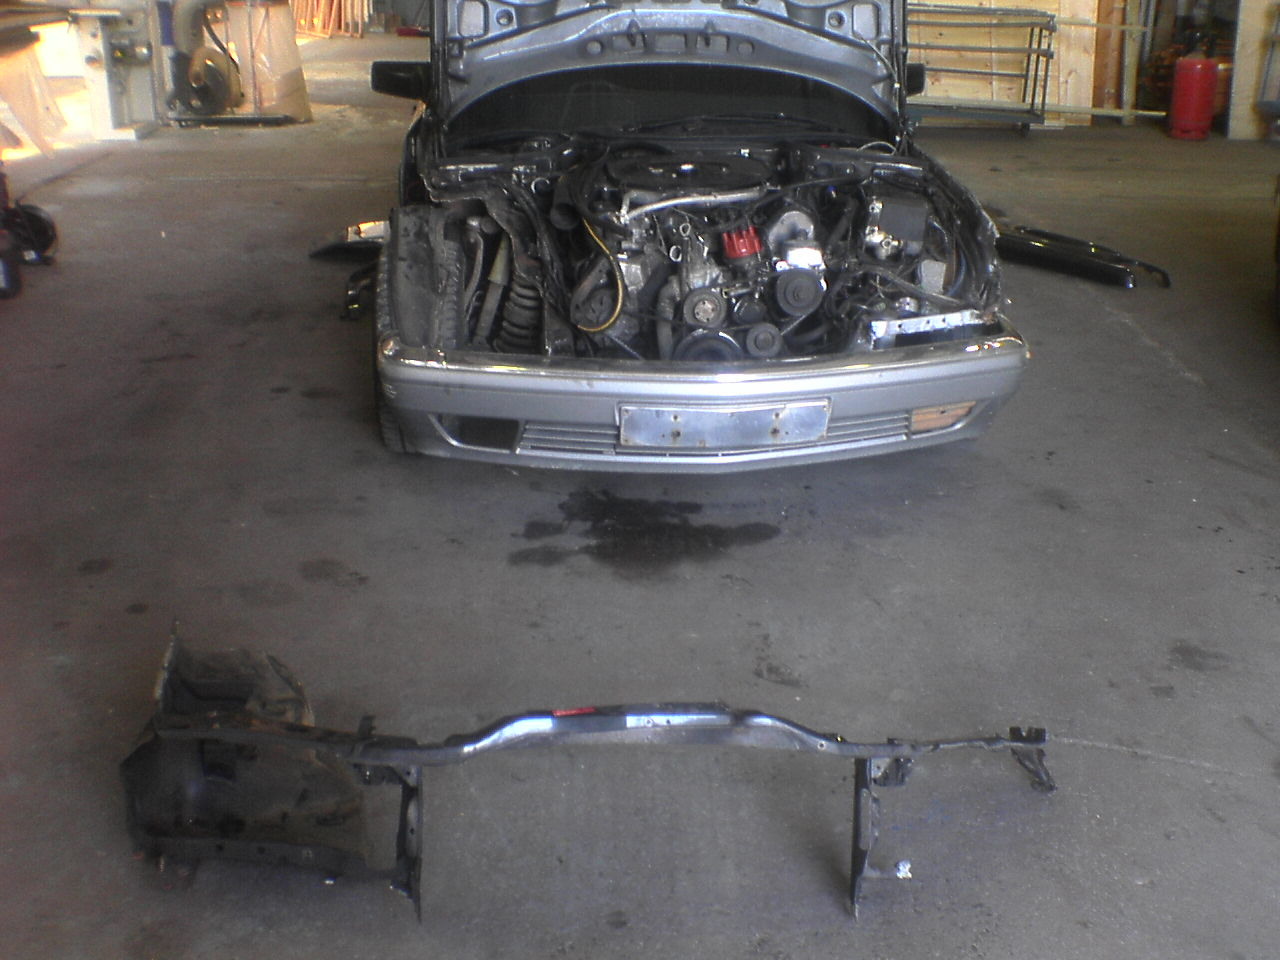 The W126 restoration thread